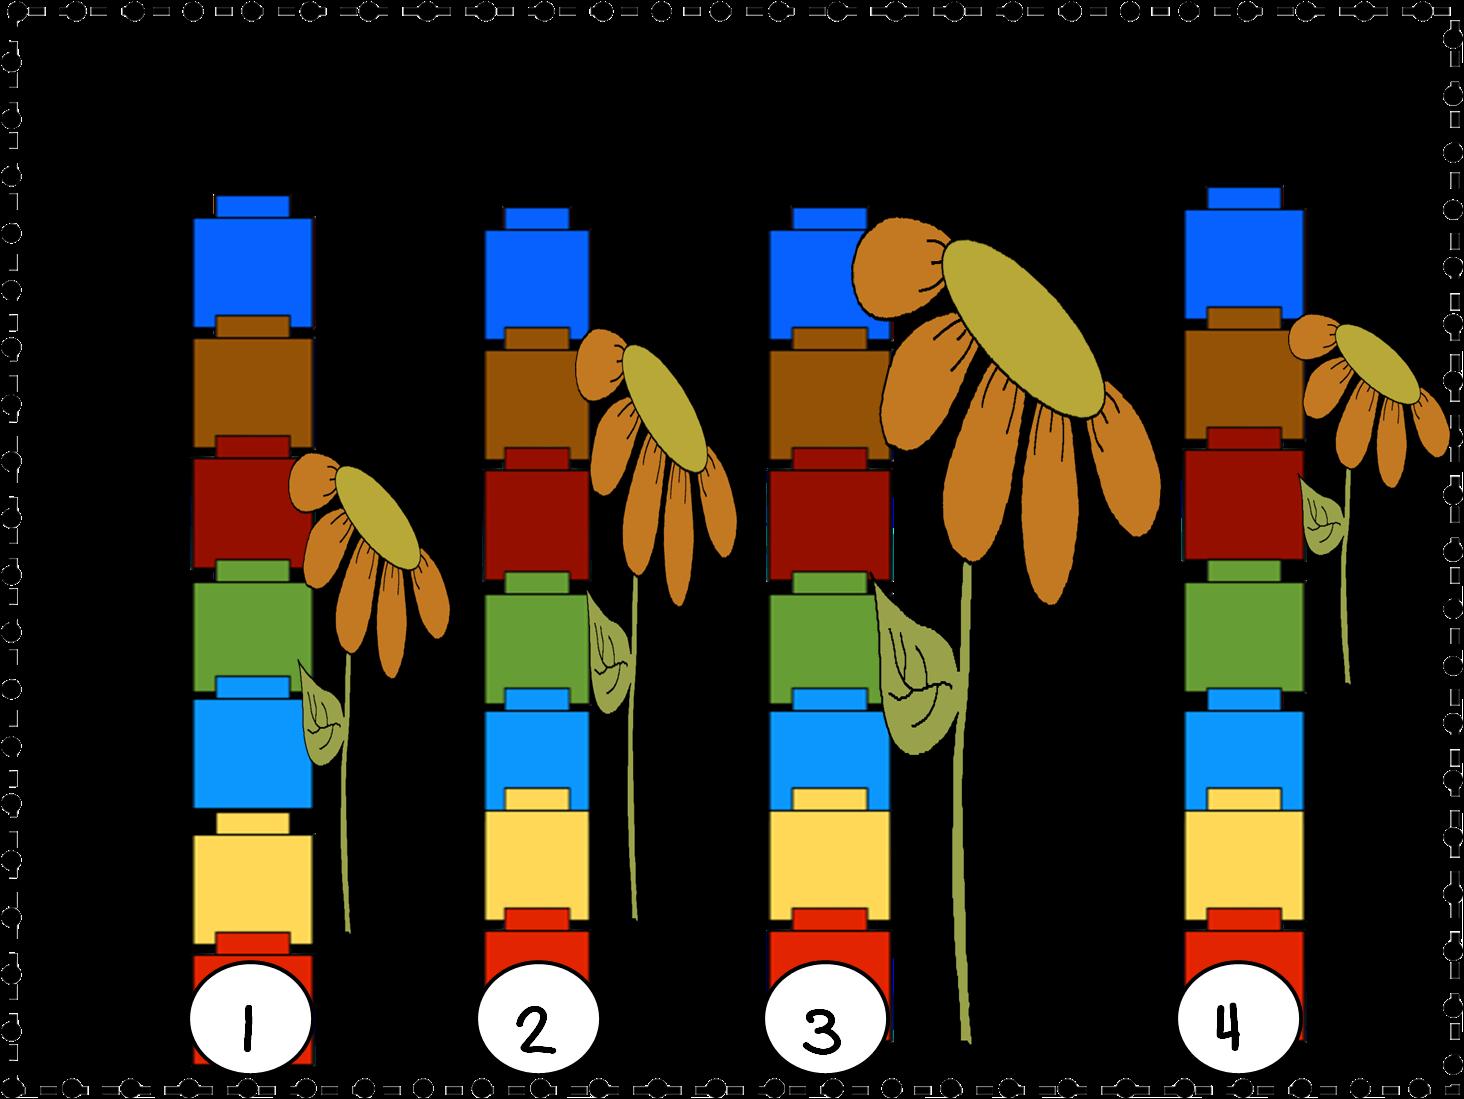 worksheet Non Standard Measurement Worksheets non standard measurement worksheets for kindergarten first grade wow april 2014 kindergarten